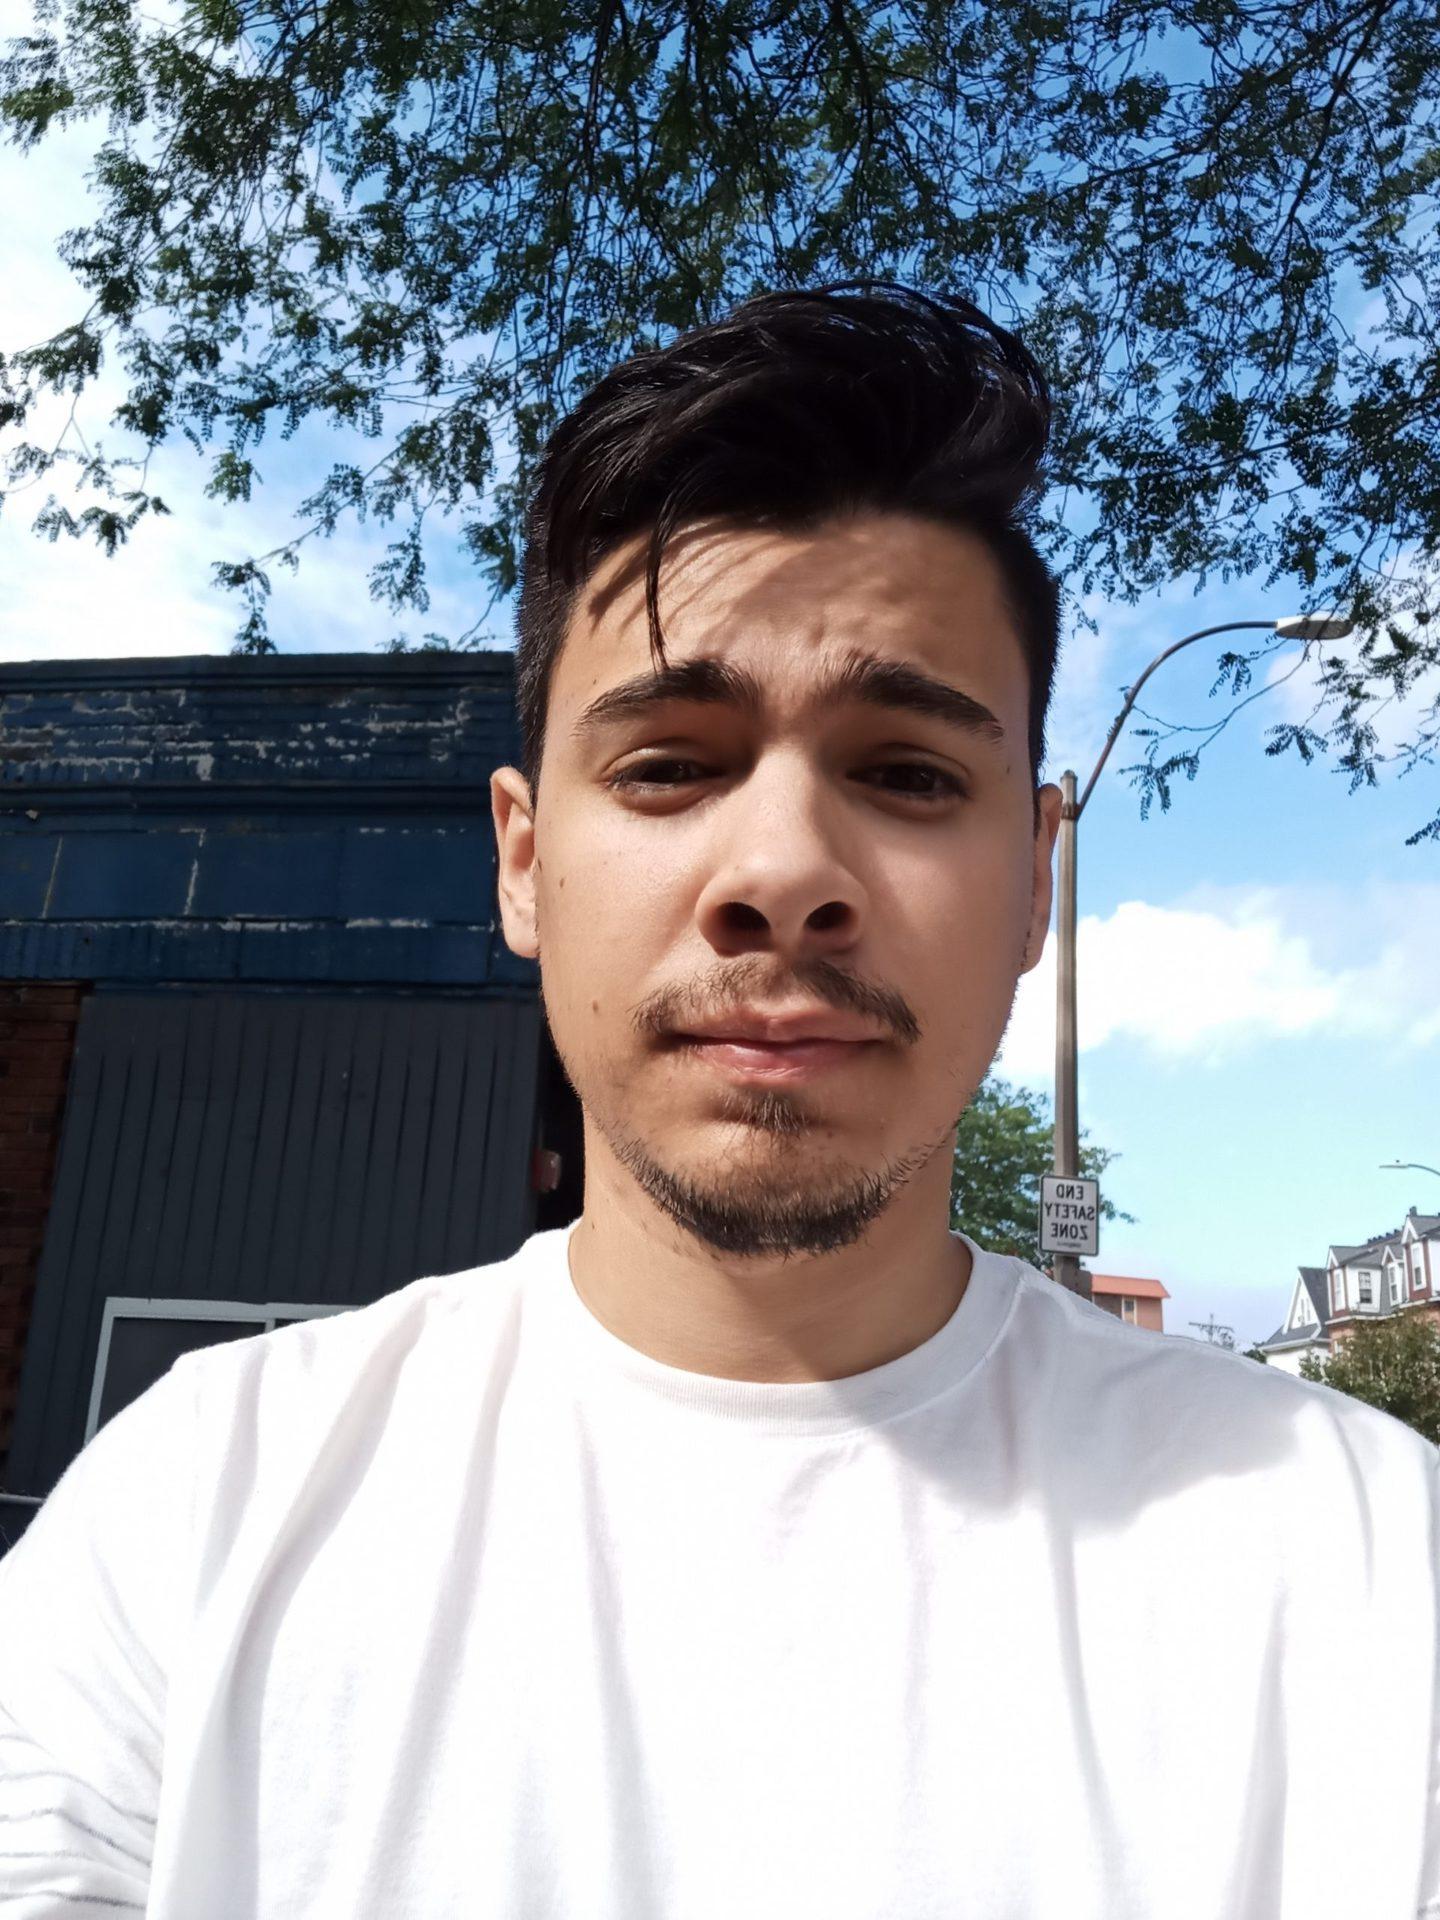 Selfie photo of man outdoors with dark hair and beard, wearing a white t-shirt taken on Blu G91 Pro